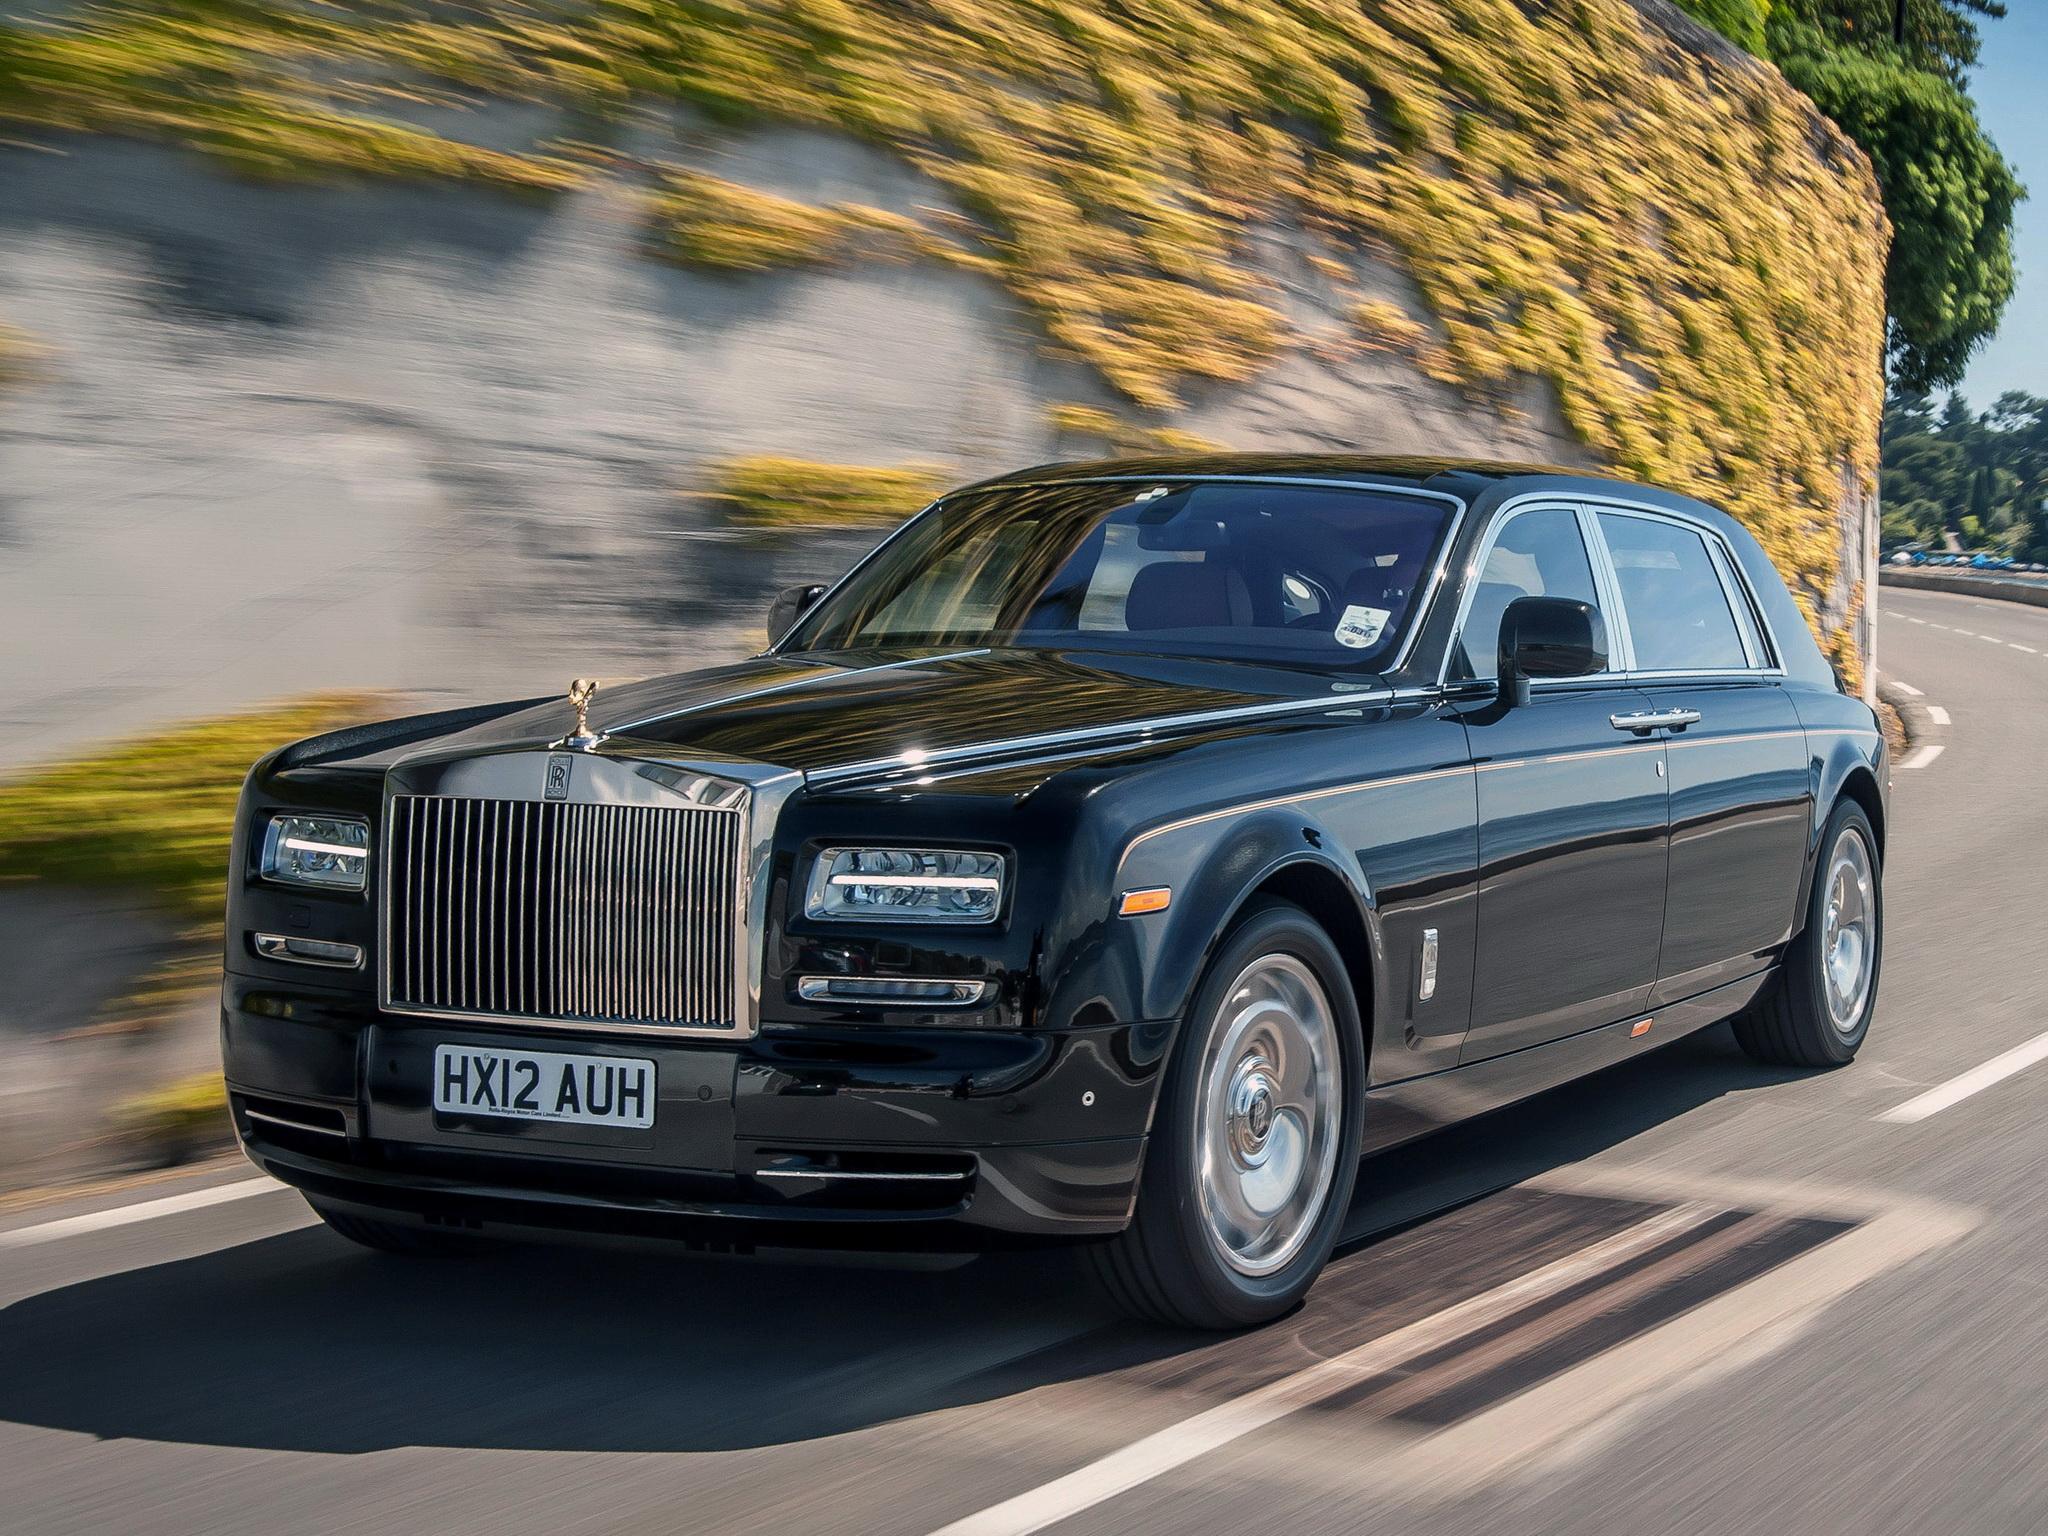 Rolls Royce Phantom Desktop Wallpaper